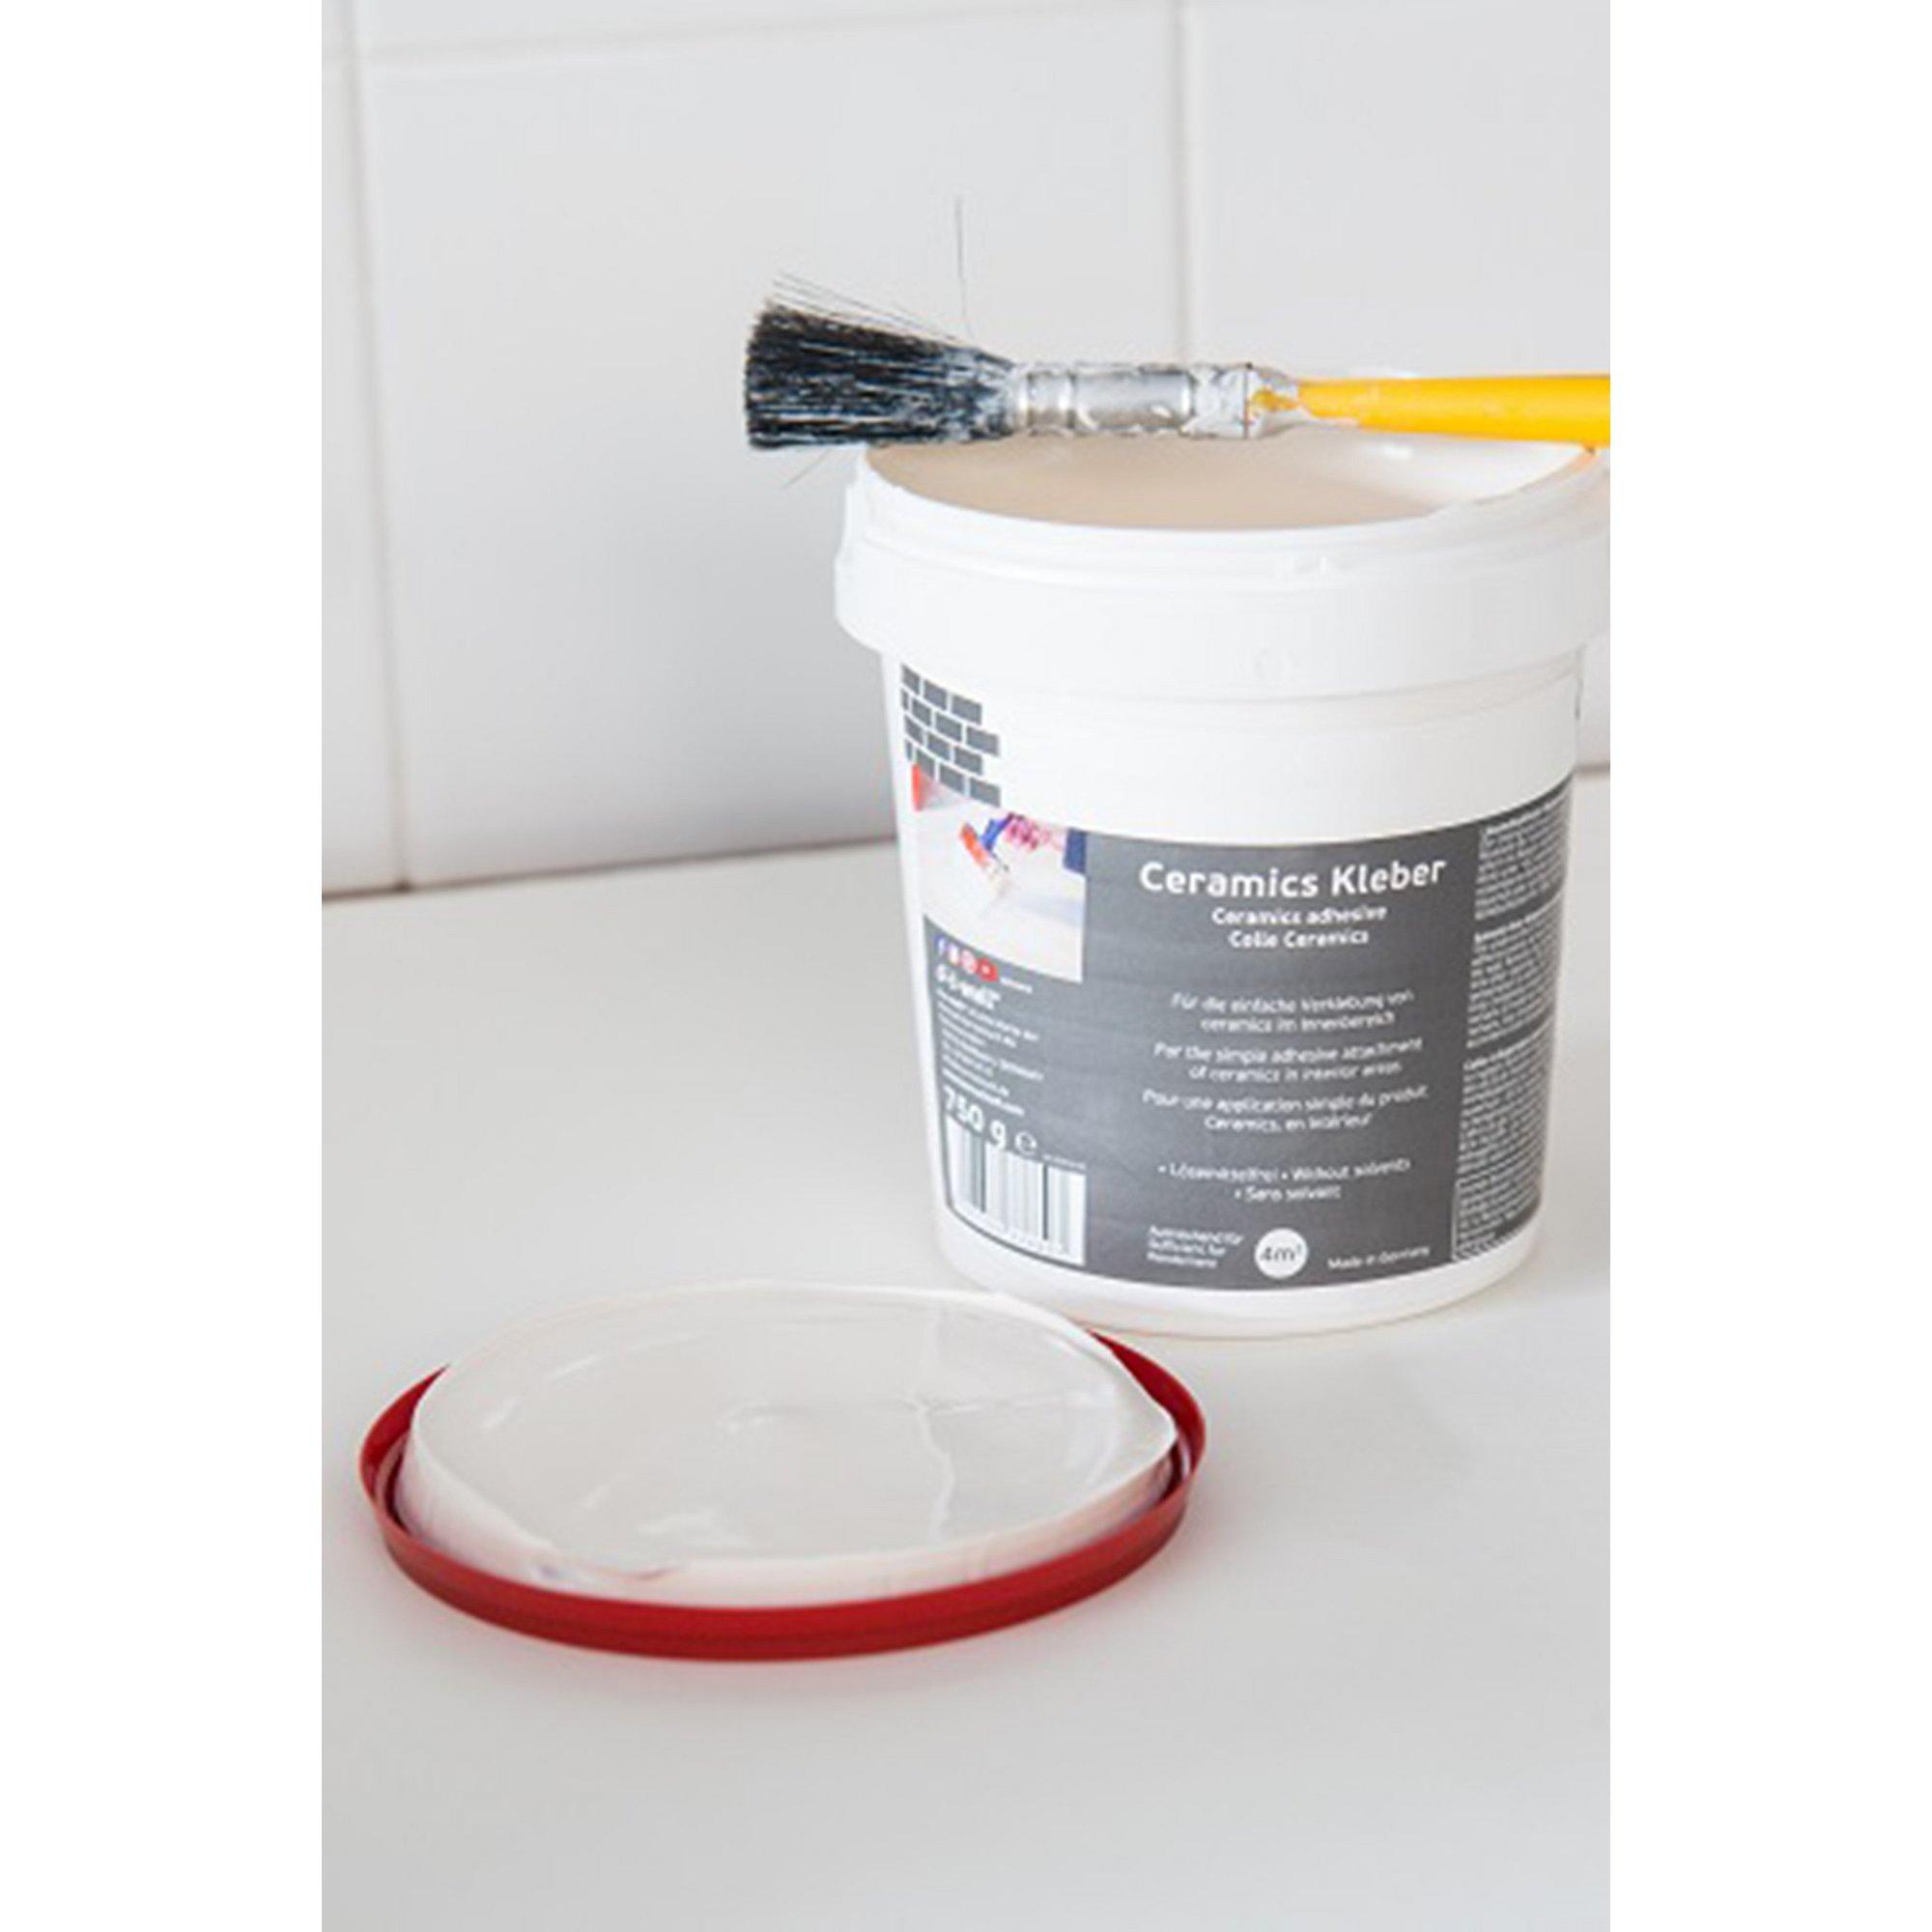 Image of 3D Wallpaper Glue for D-C-Fix Rolls 750g